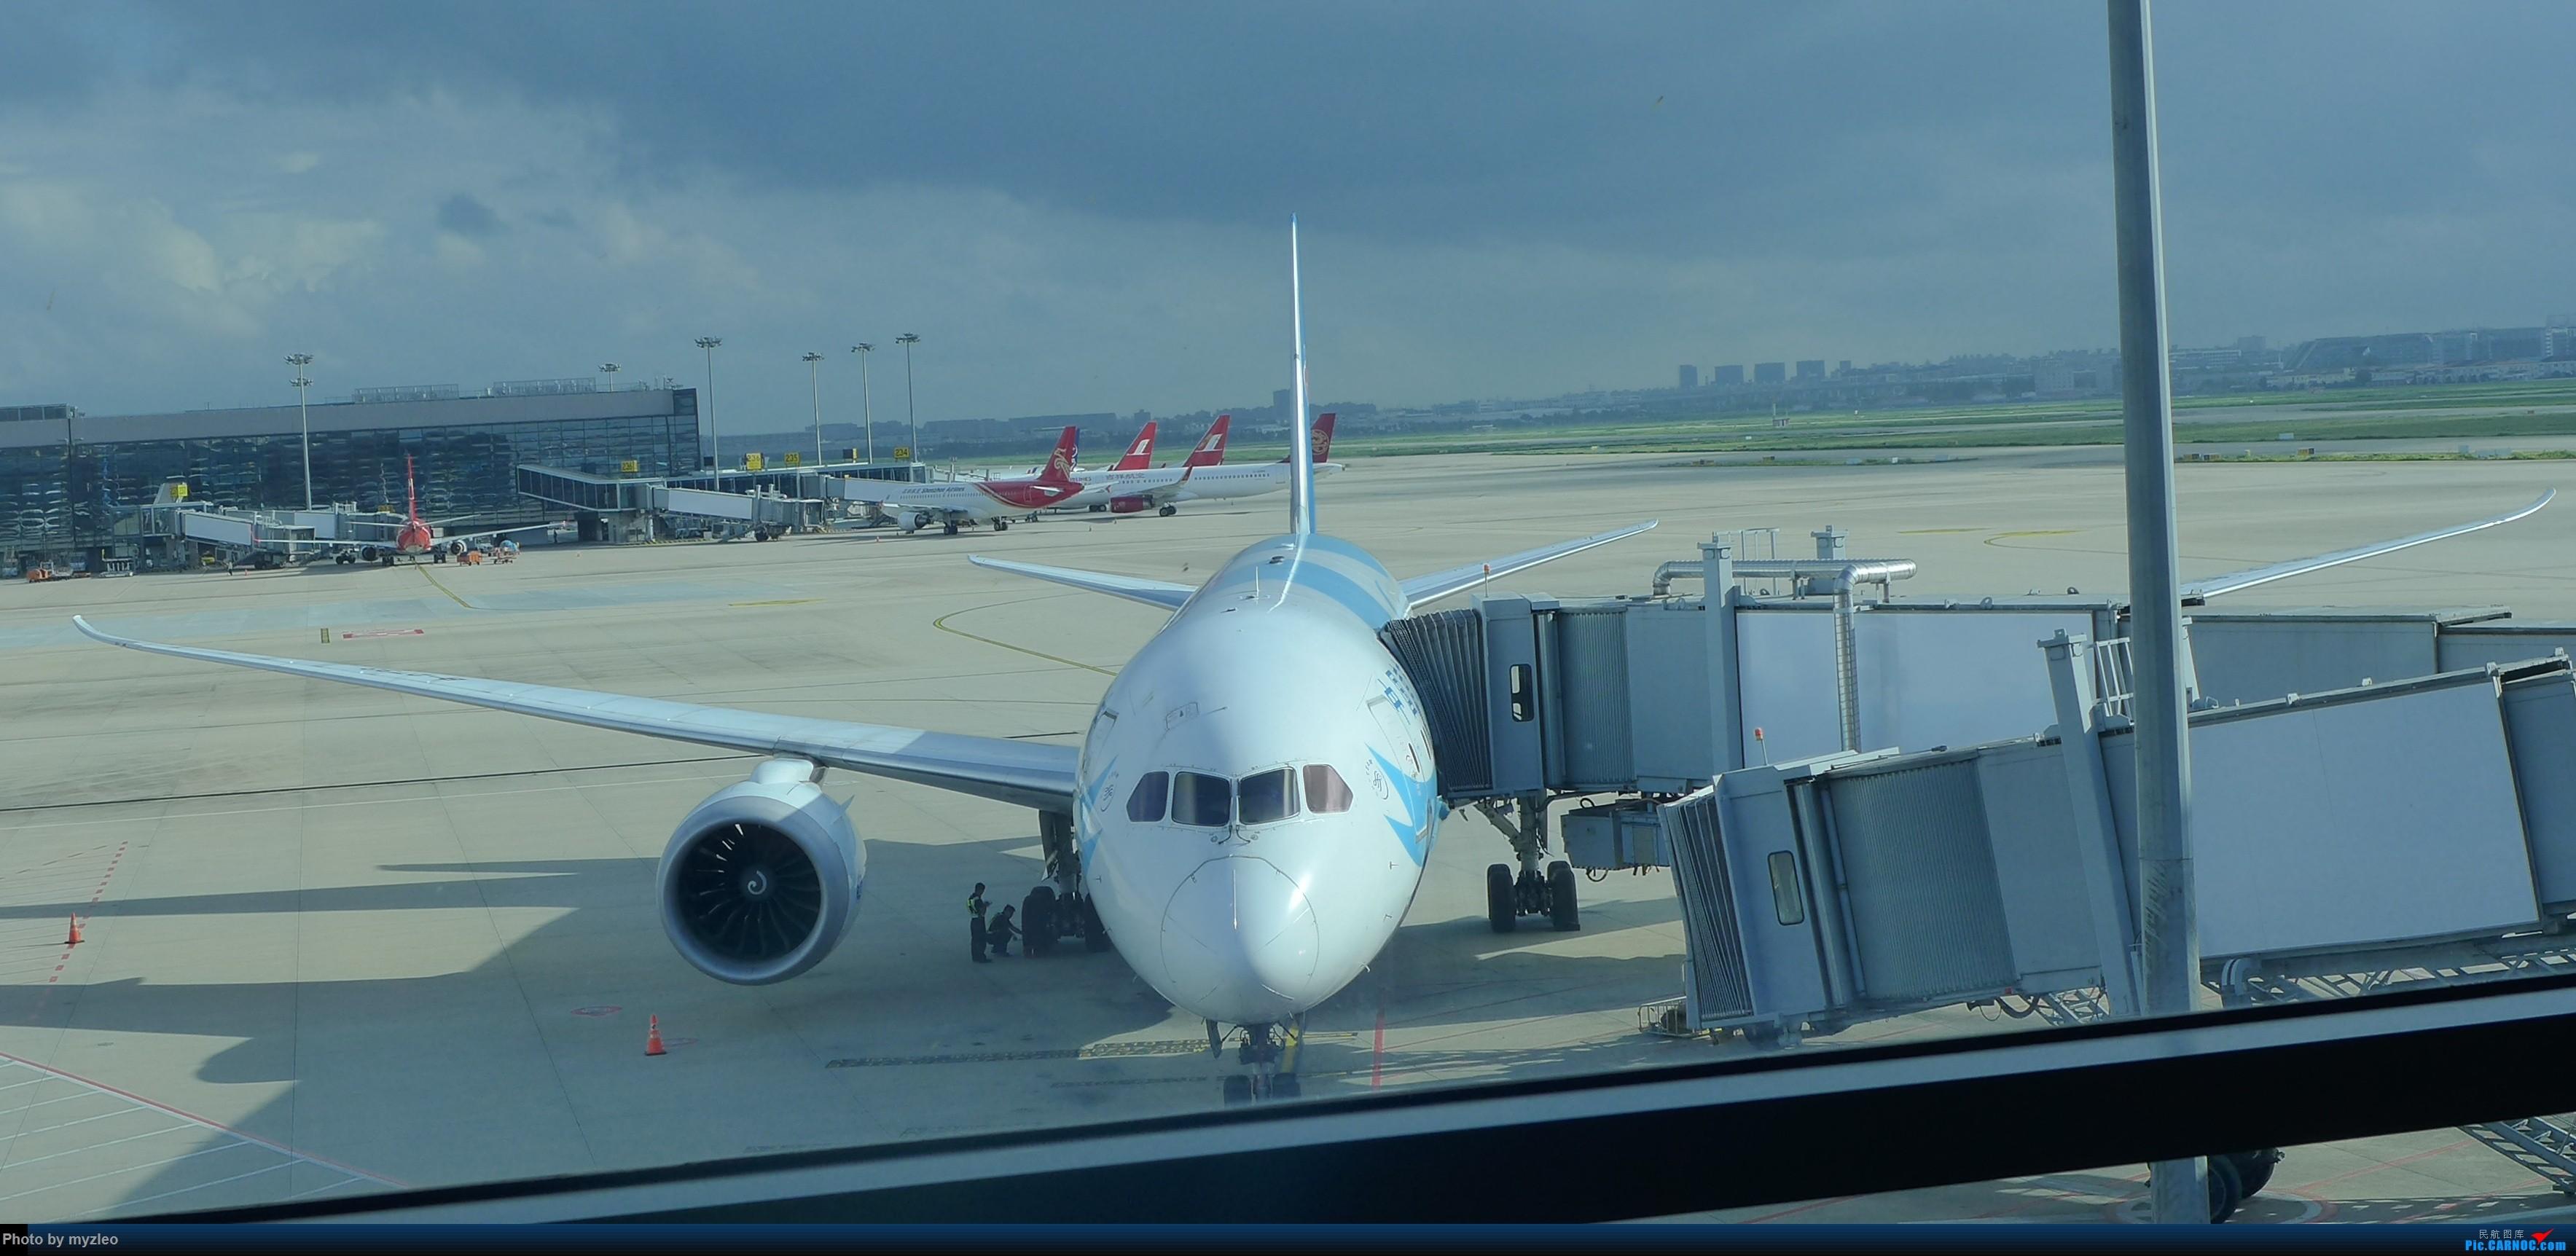 Re:[原创]【myzleo的游记3.1】三访帝都——记一次意外的惊喜,大鹅头初遇,第一次去中关村 BOEING 787-8 B-2733 中国上海虹桥国际机场